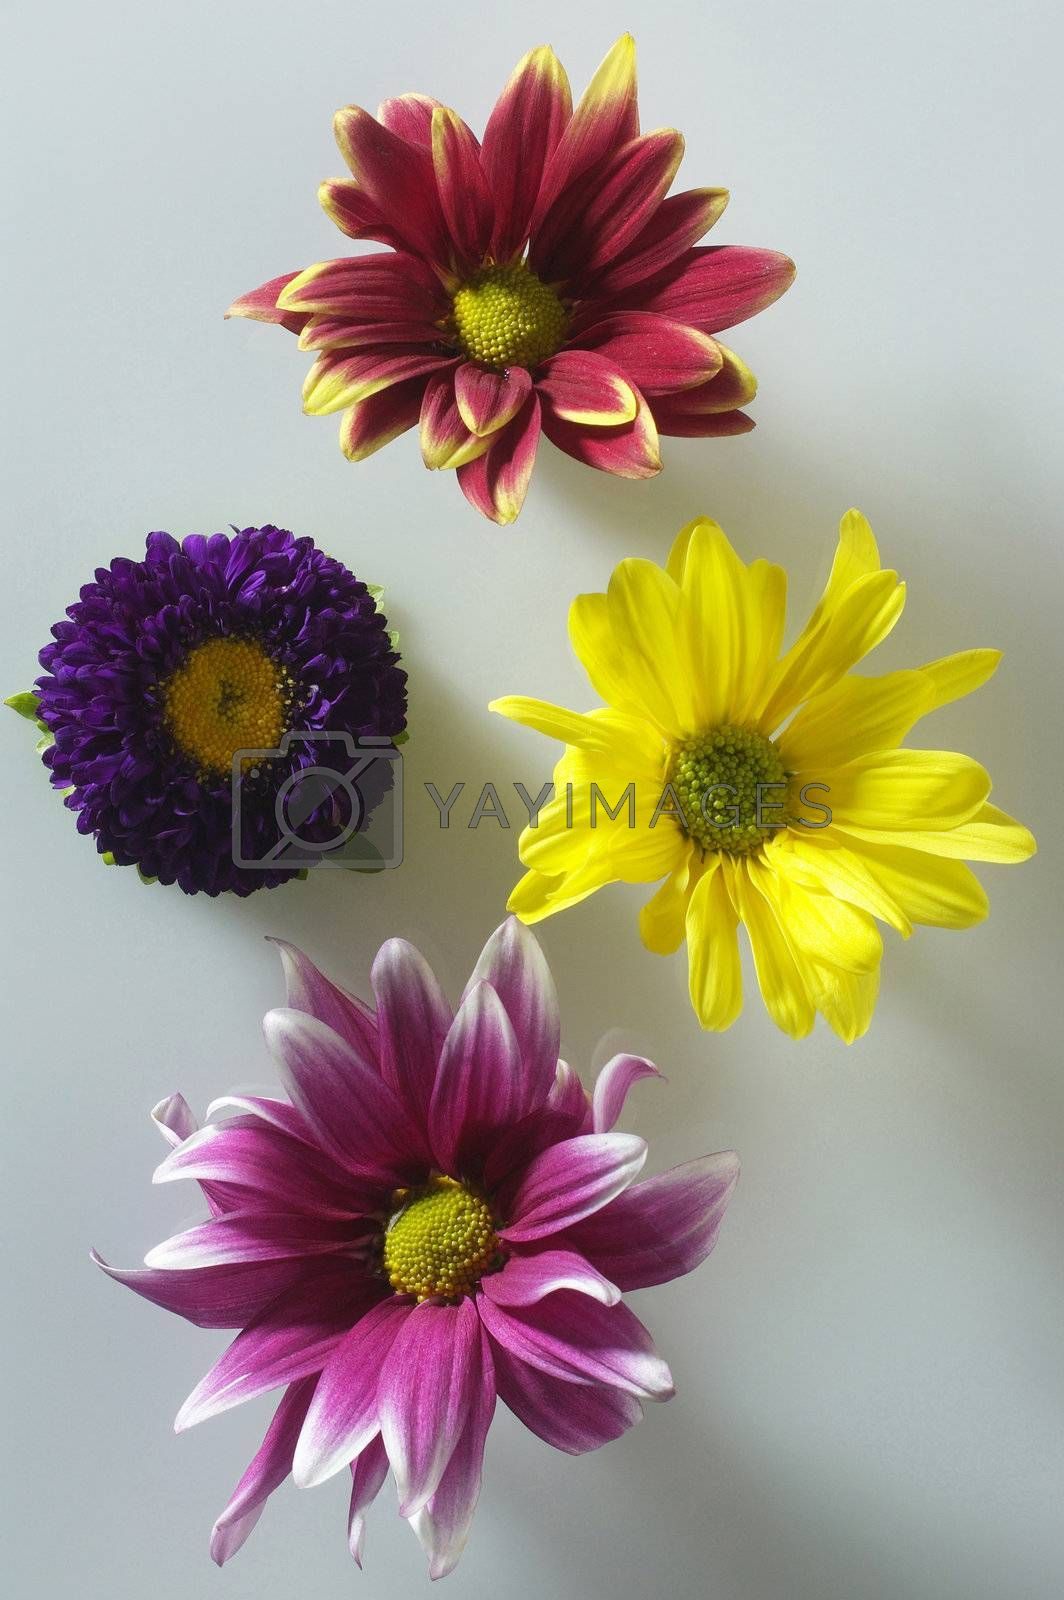 close up of the Chrysanthemum flower